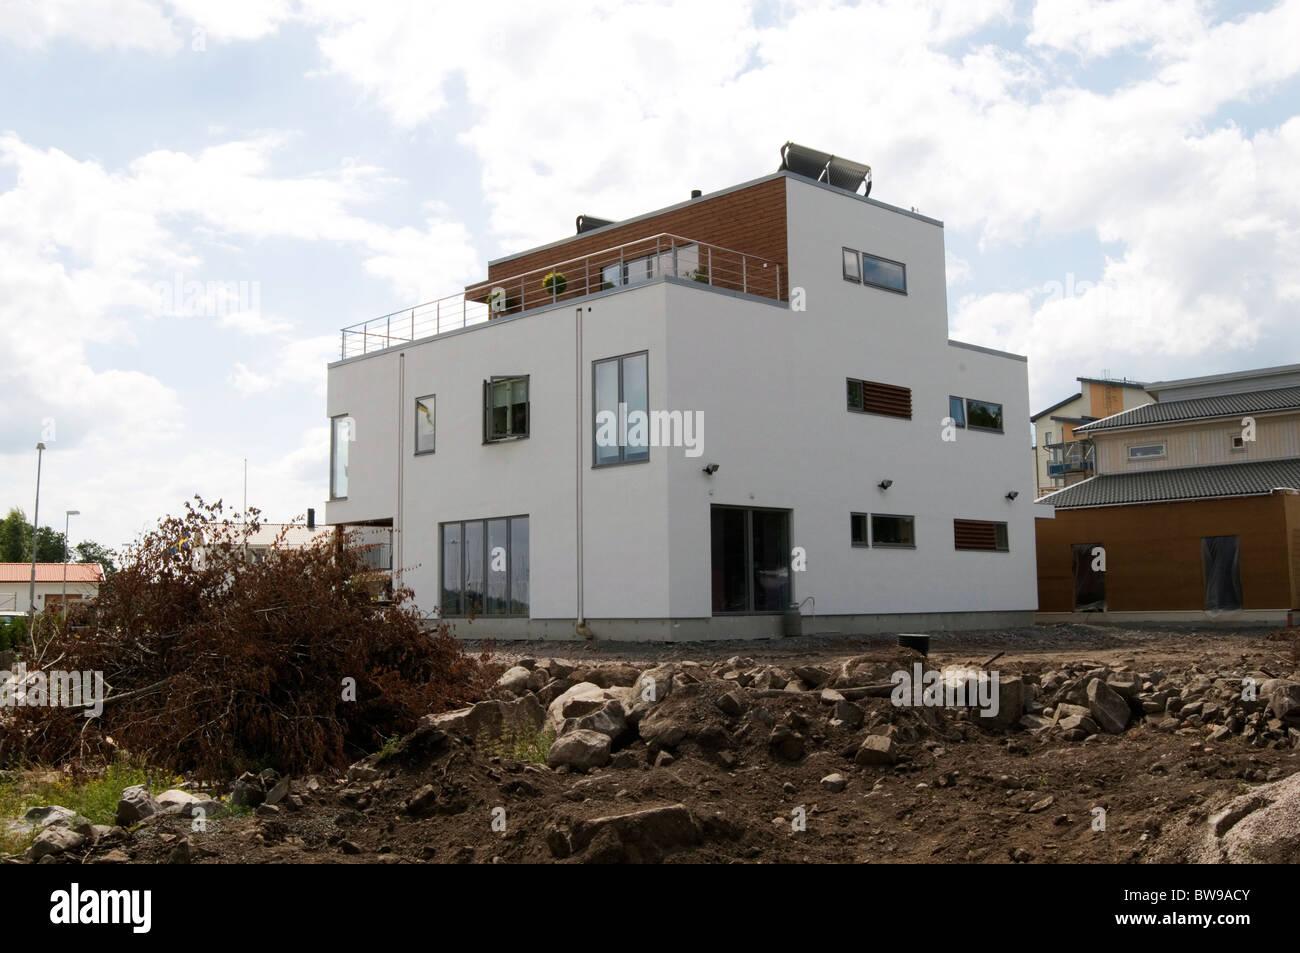 swedish modern home house homes houses grand designs white modernism stock photo 32782539 alamy. Black Bedroom Furniture Sets. Home Design Ideas